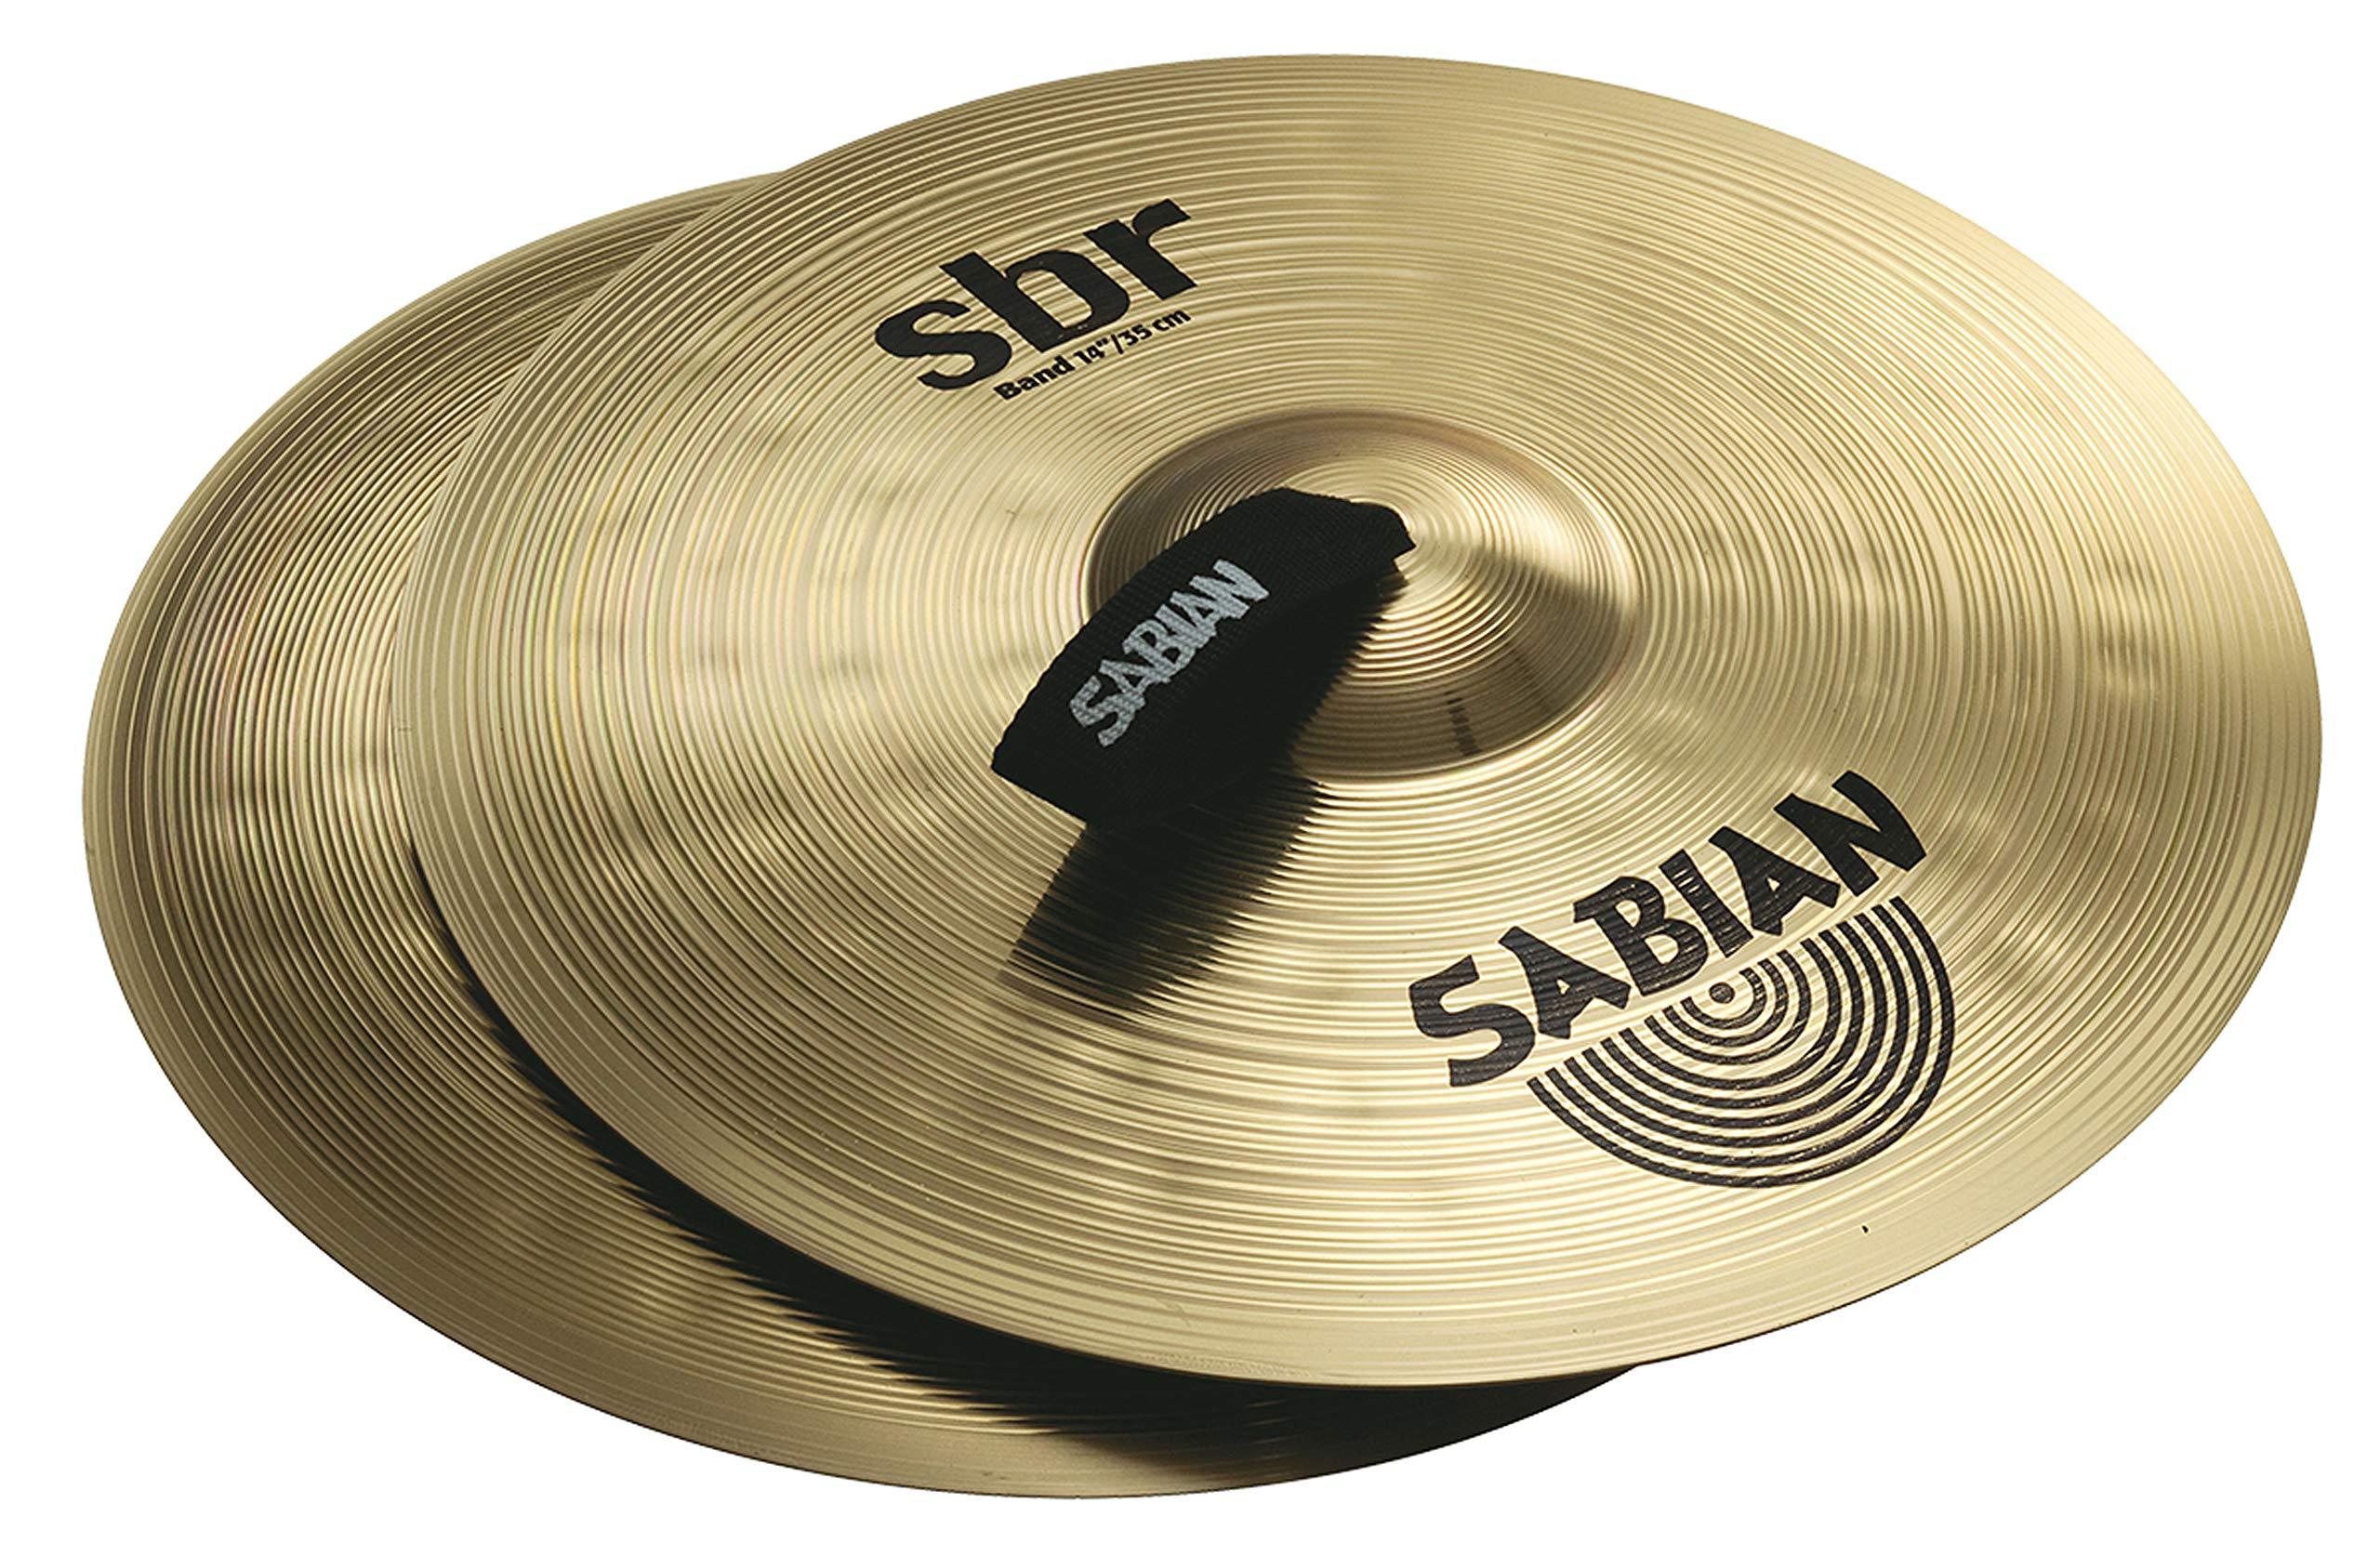 Sabian SBR 14'' Band Cymbals by Sabian